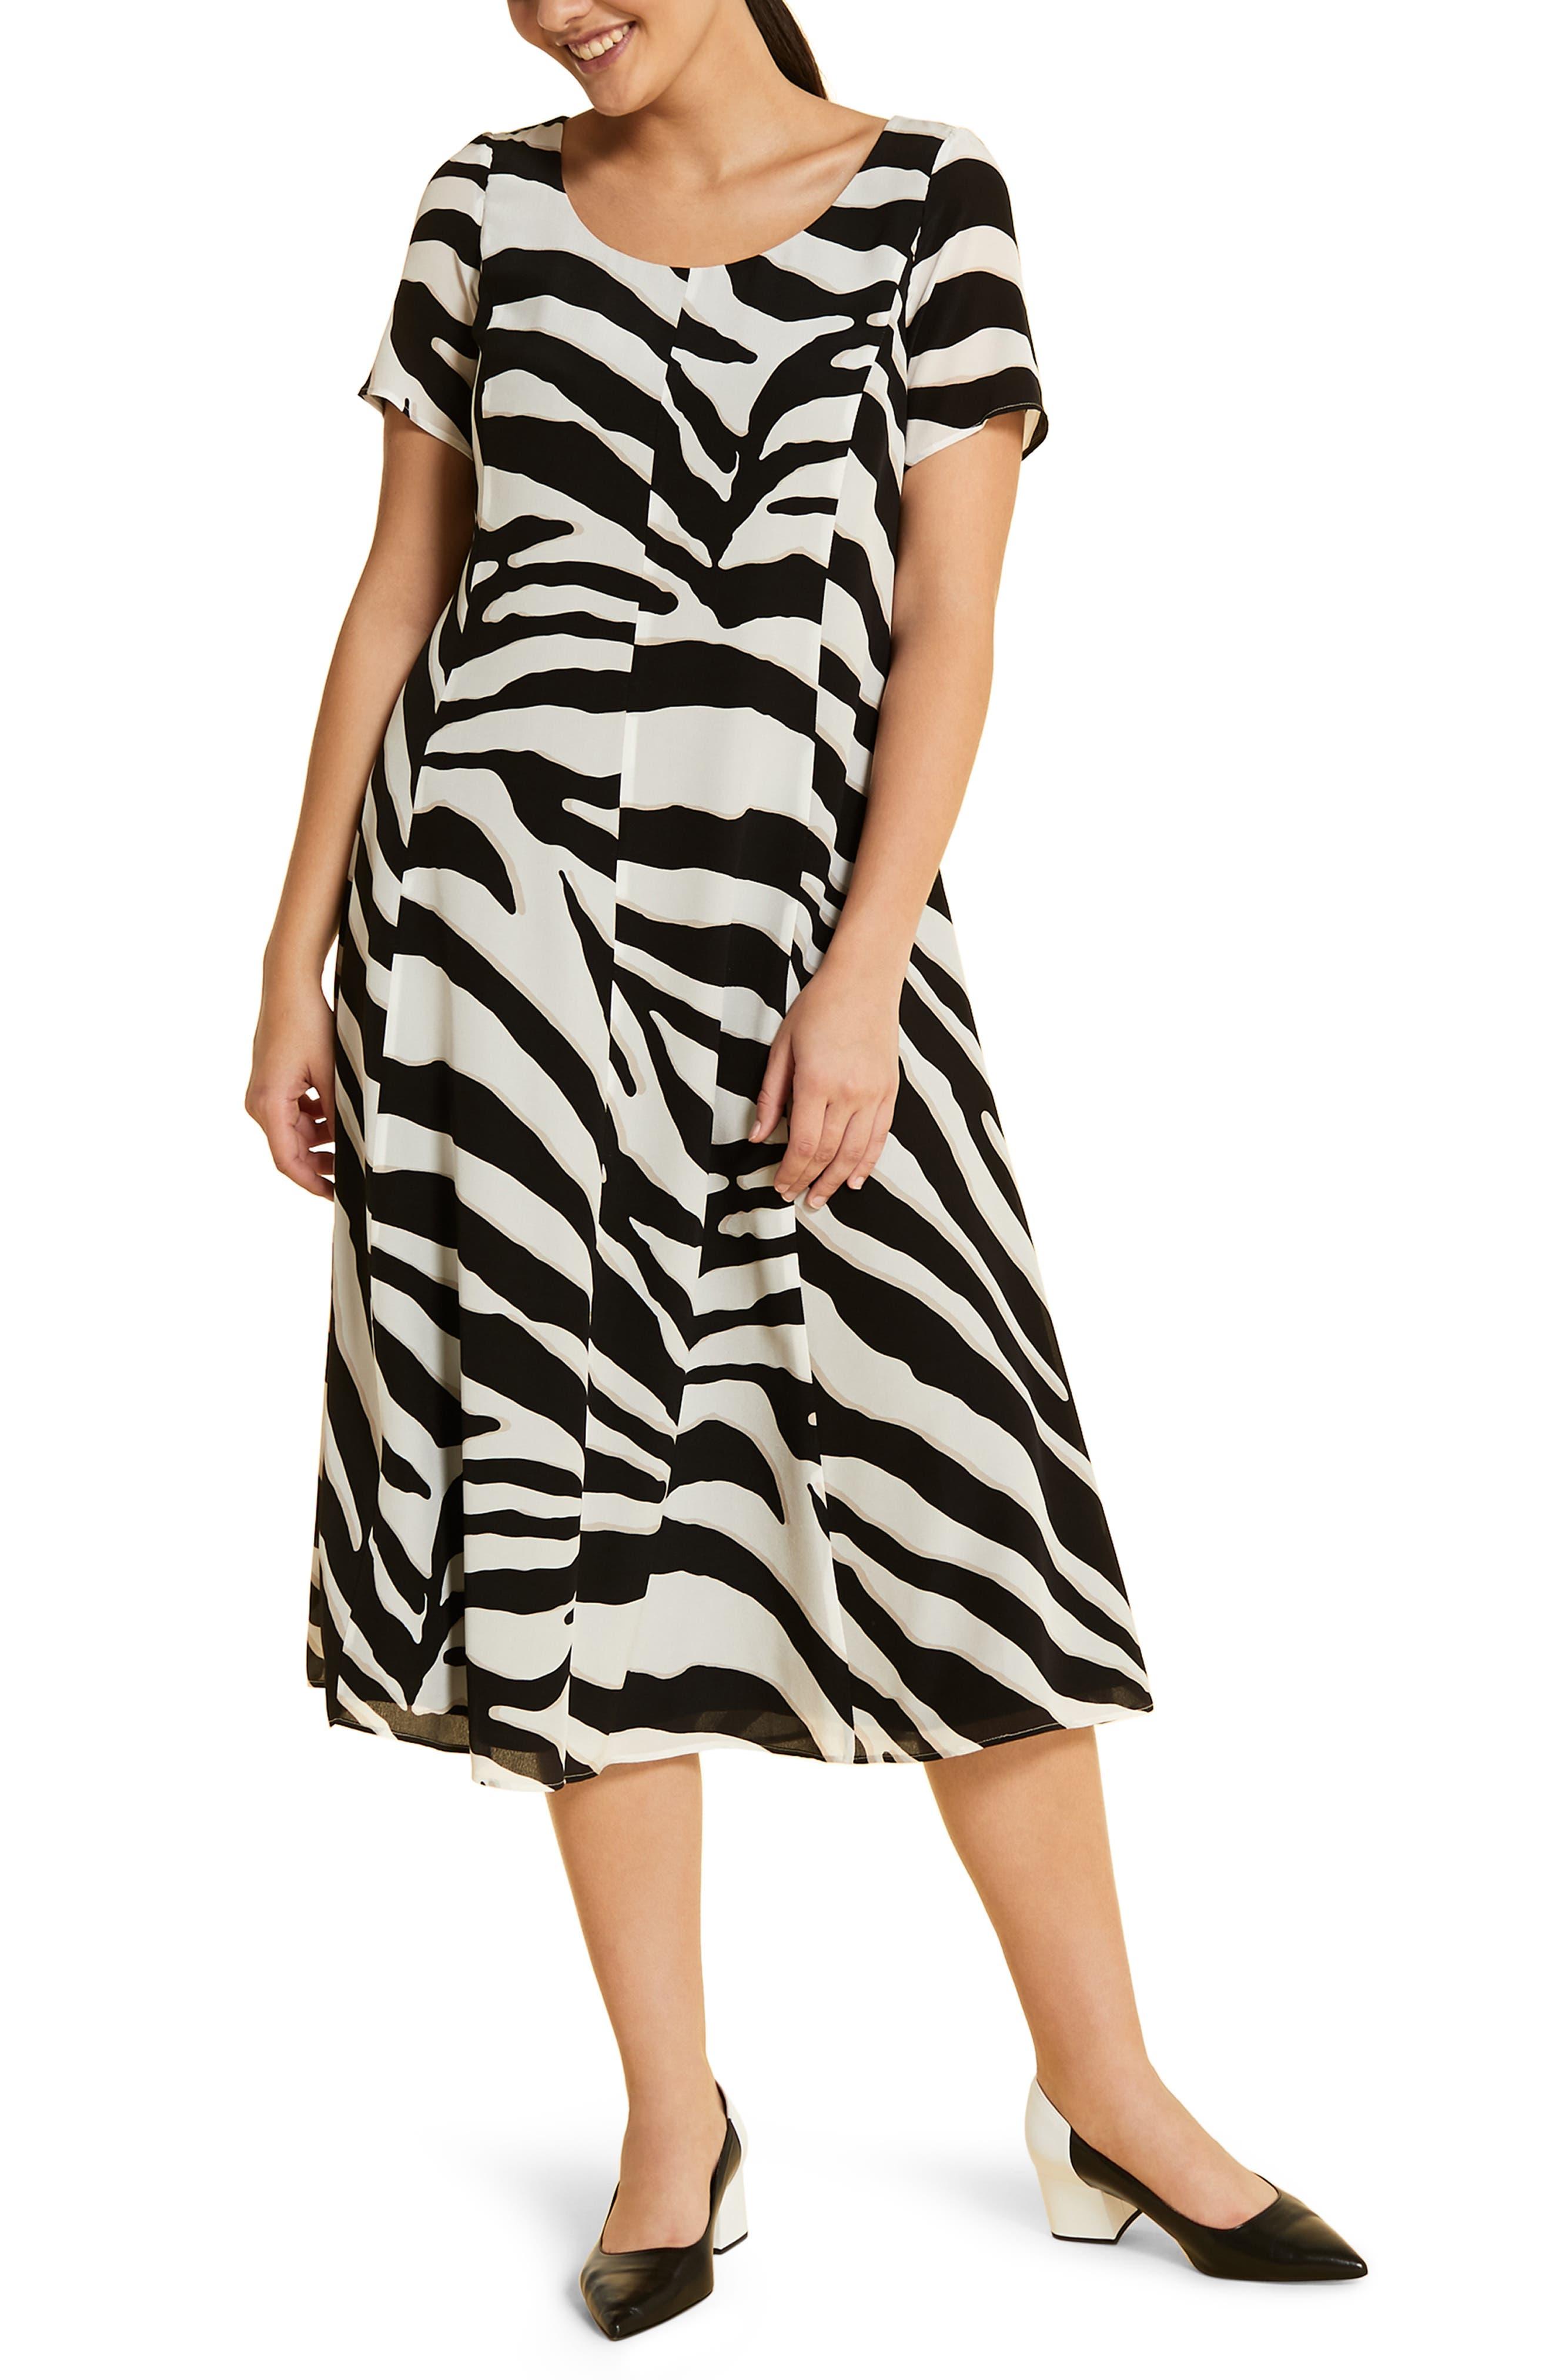 Plus Size Marina Rinaldi Docenza Silk Dress, Black